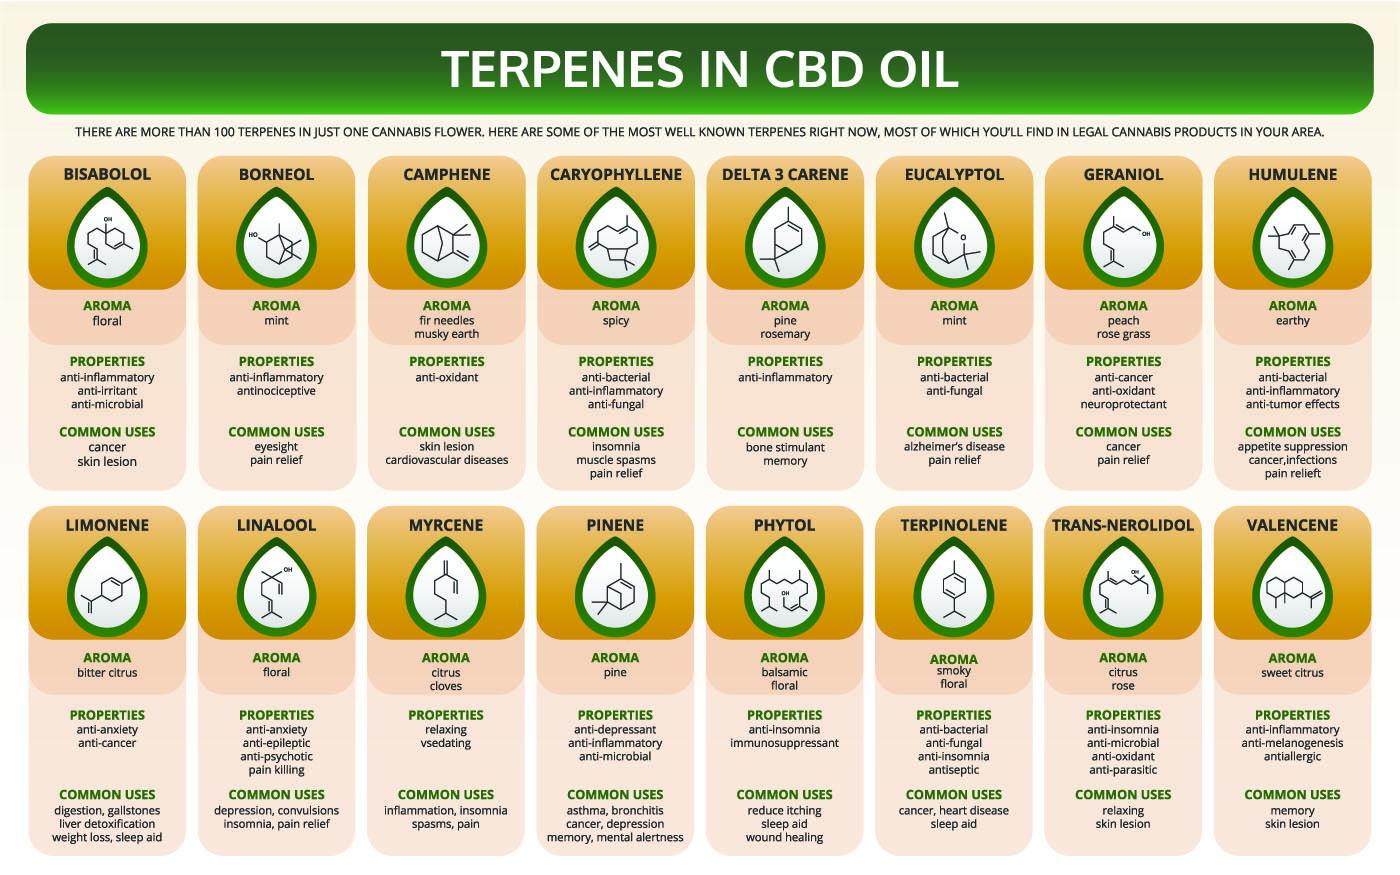 Terpenes in CBD Oil infographic